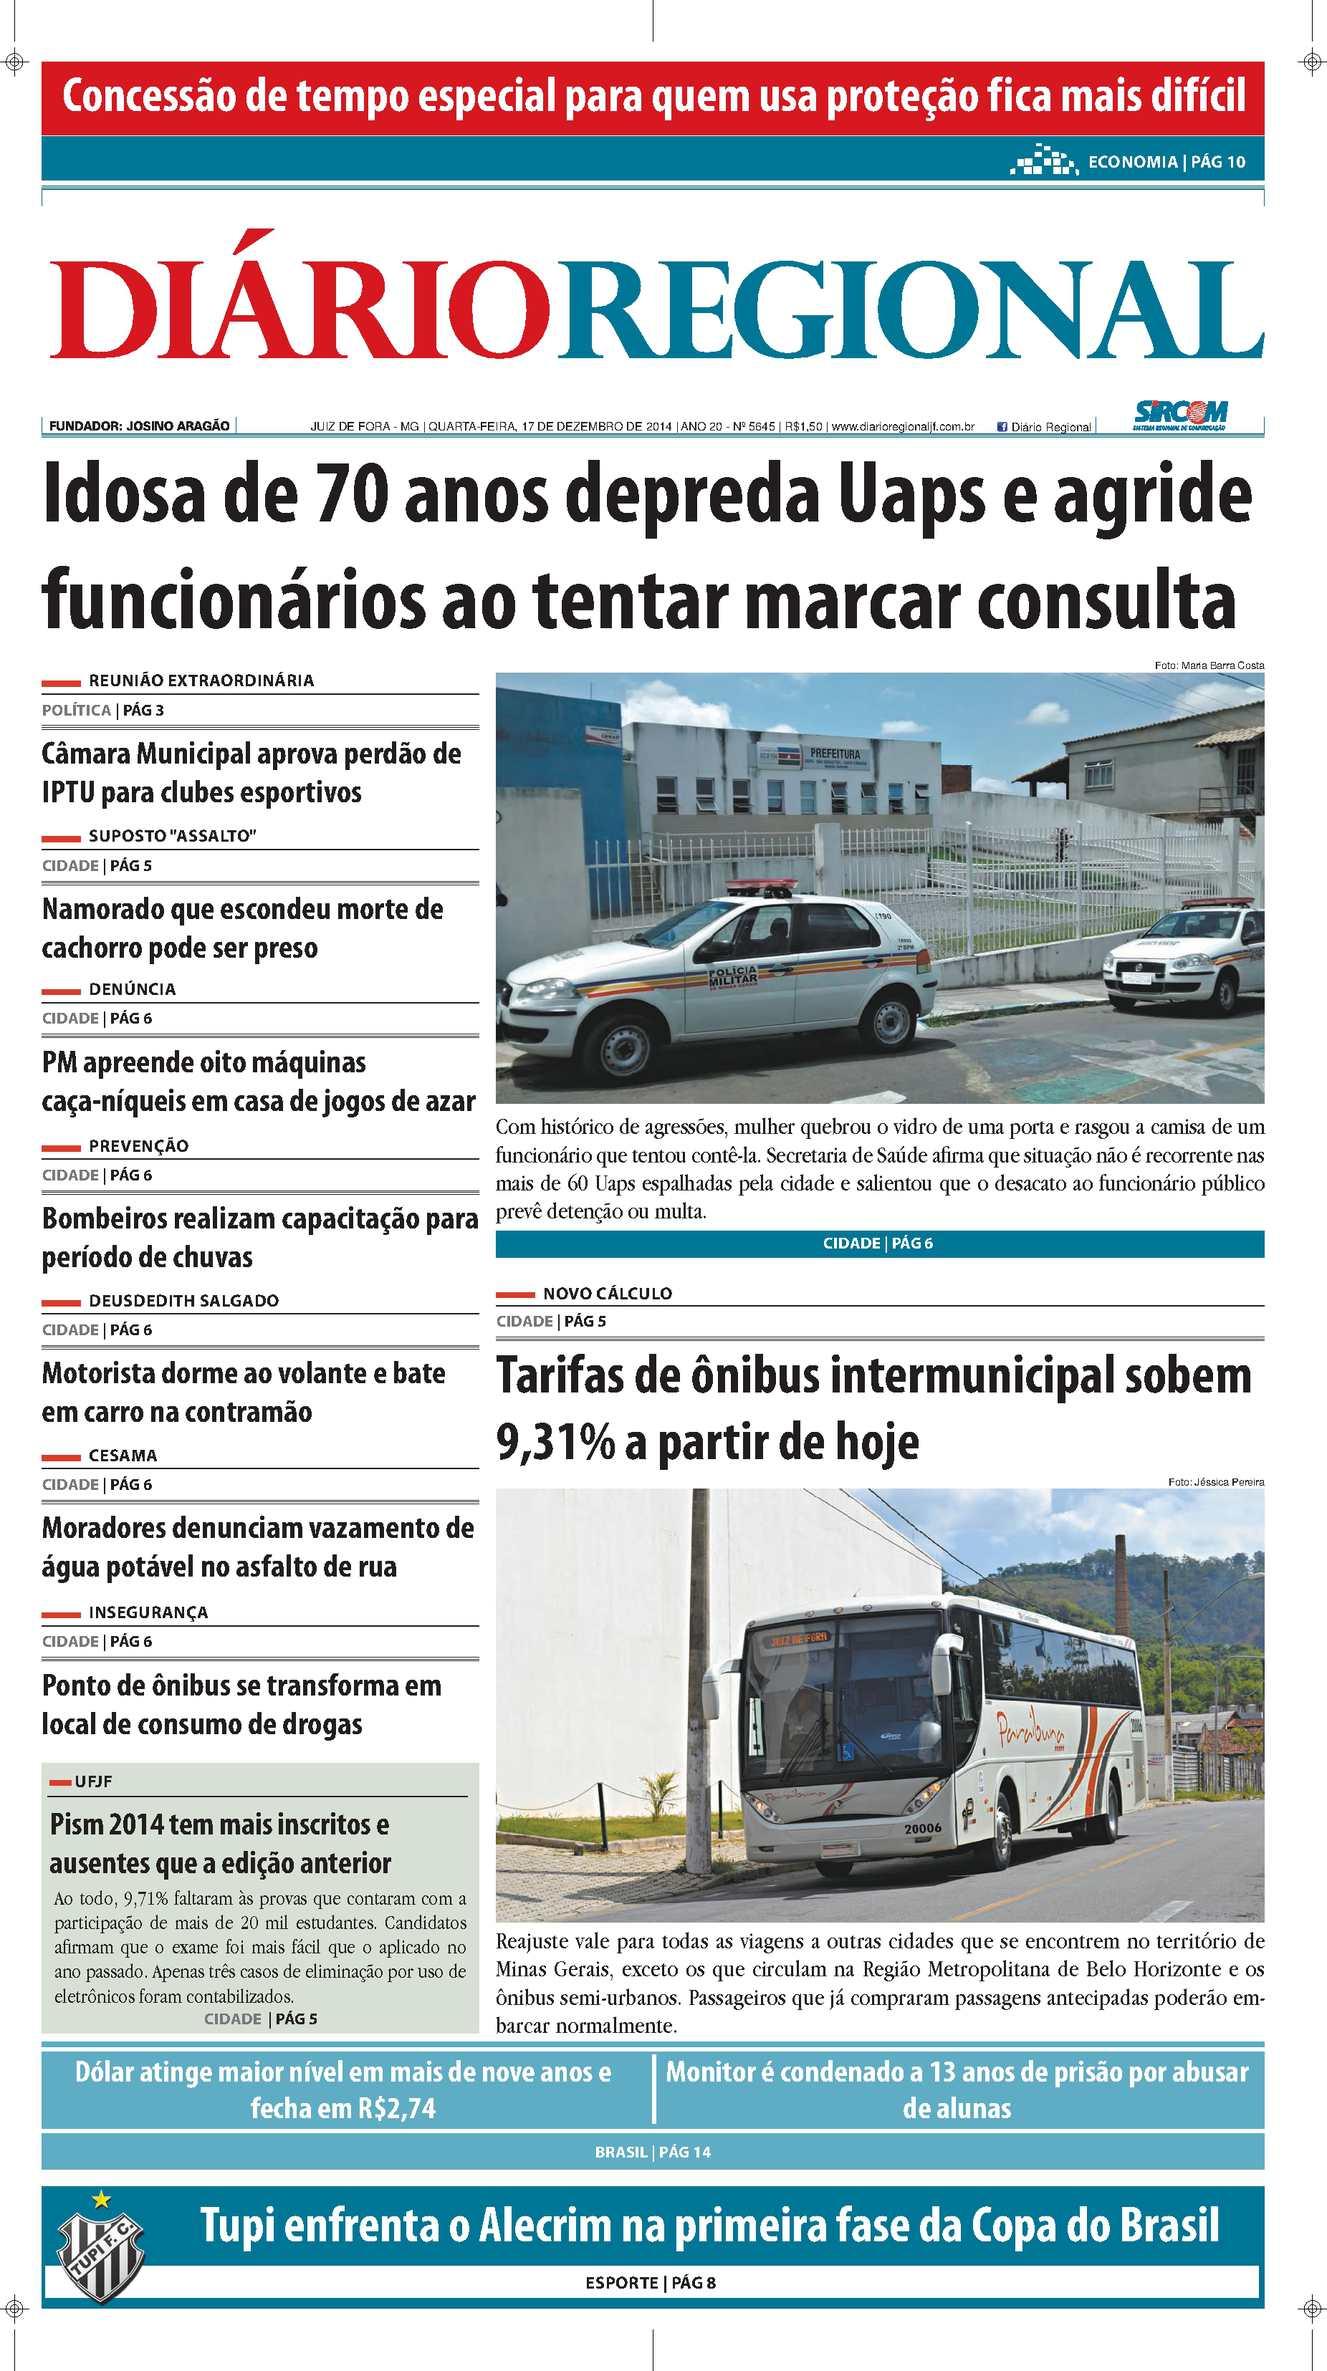 Calaméo - Jornal Site 17 12 14 039040ab22f50